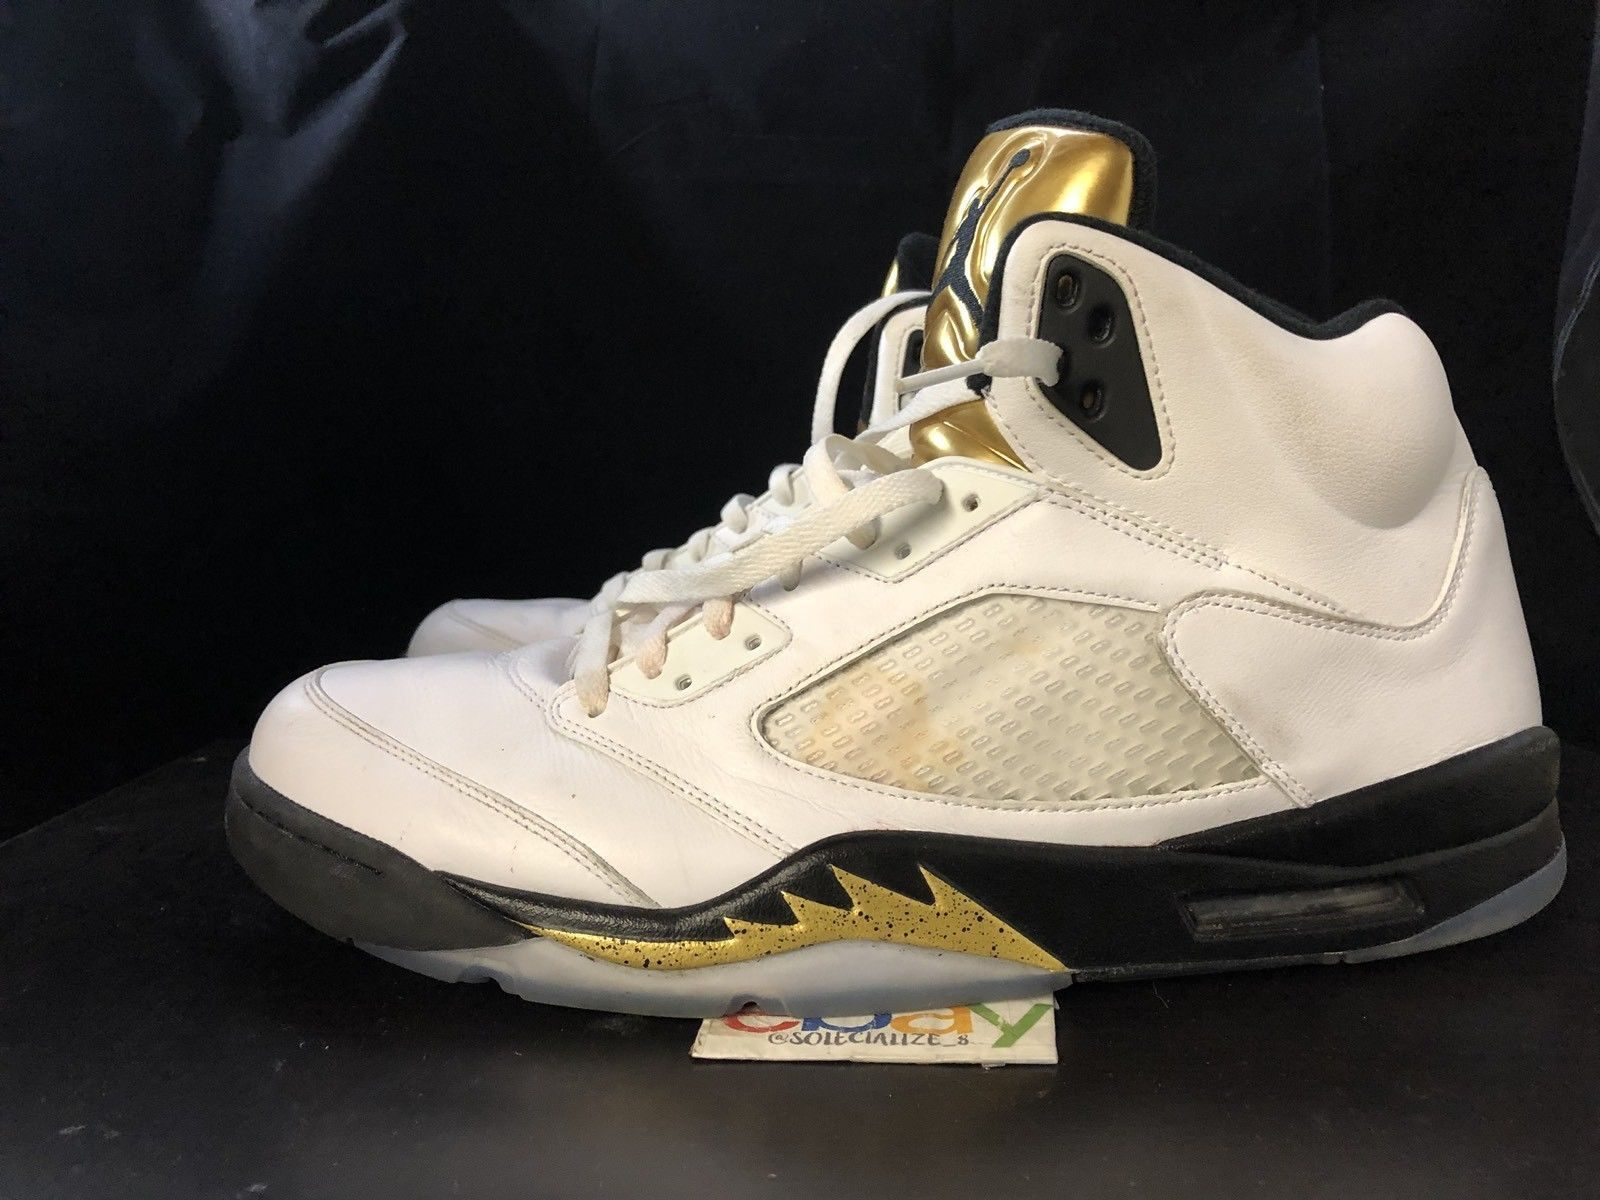 new concept 9360f ce99f Nike Air Jordan V 5 Retro OLYMPIC WHITE BLACK METALLIC GOLD COIN 136027-133  16